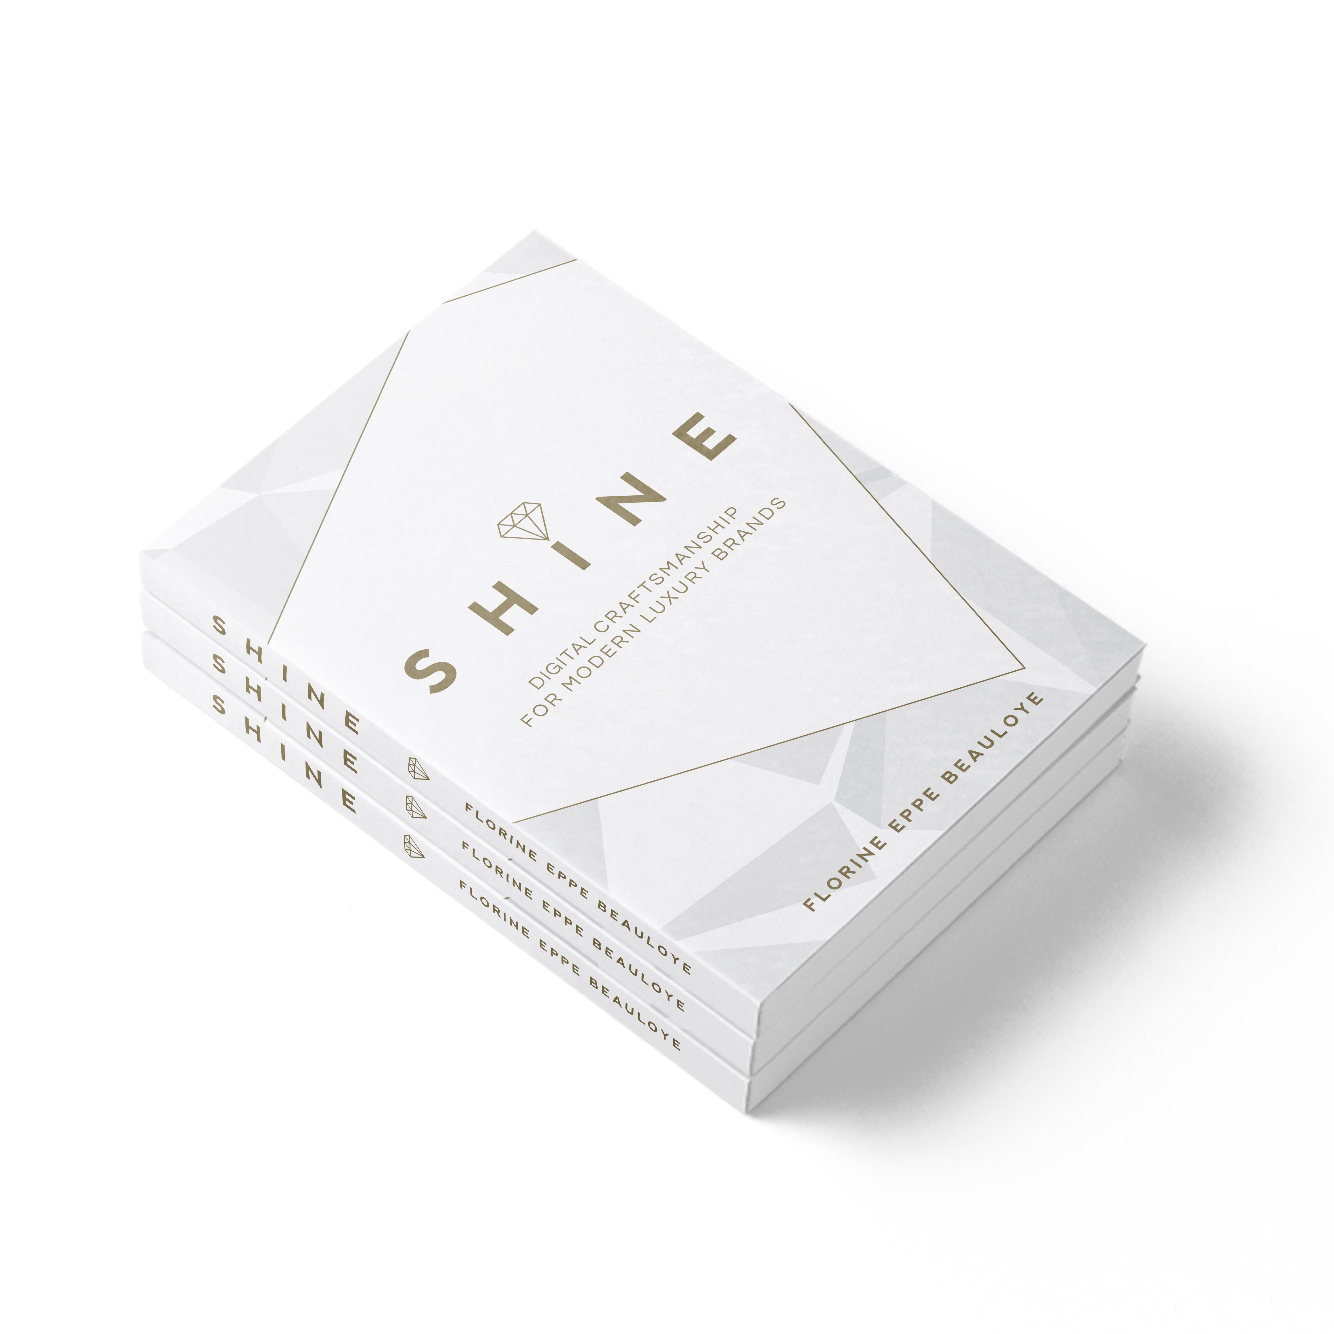 Shine digital craftsmanship modern luxury book Florine Eppe Beauloye